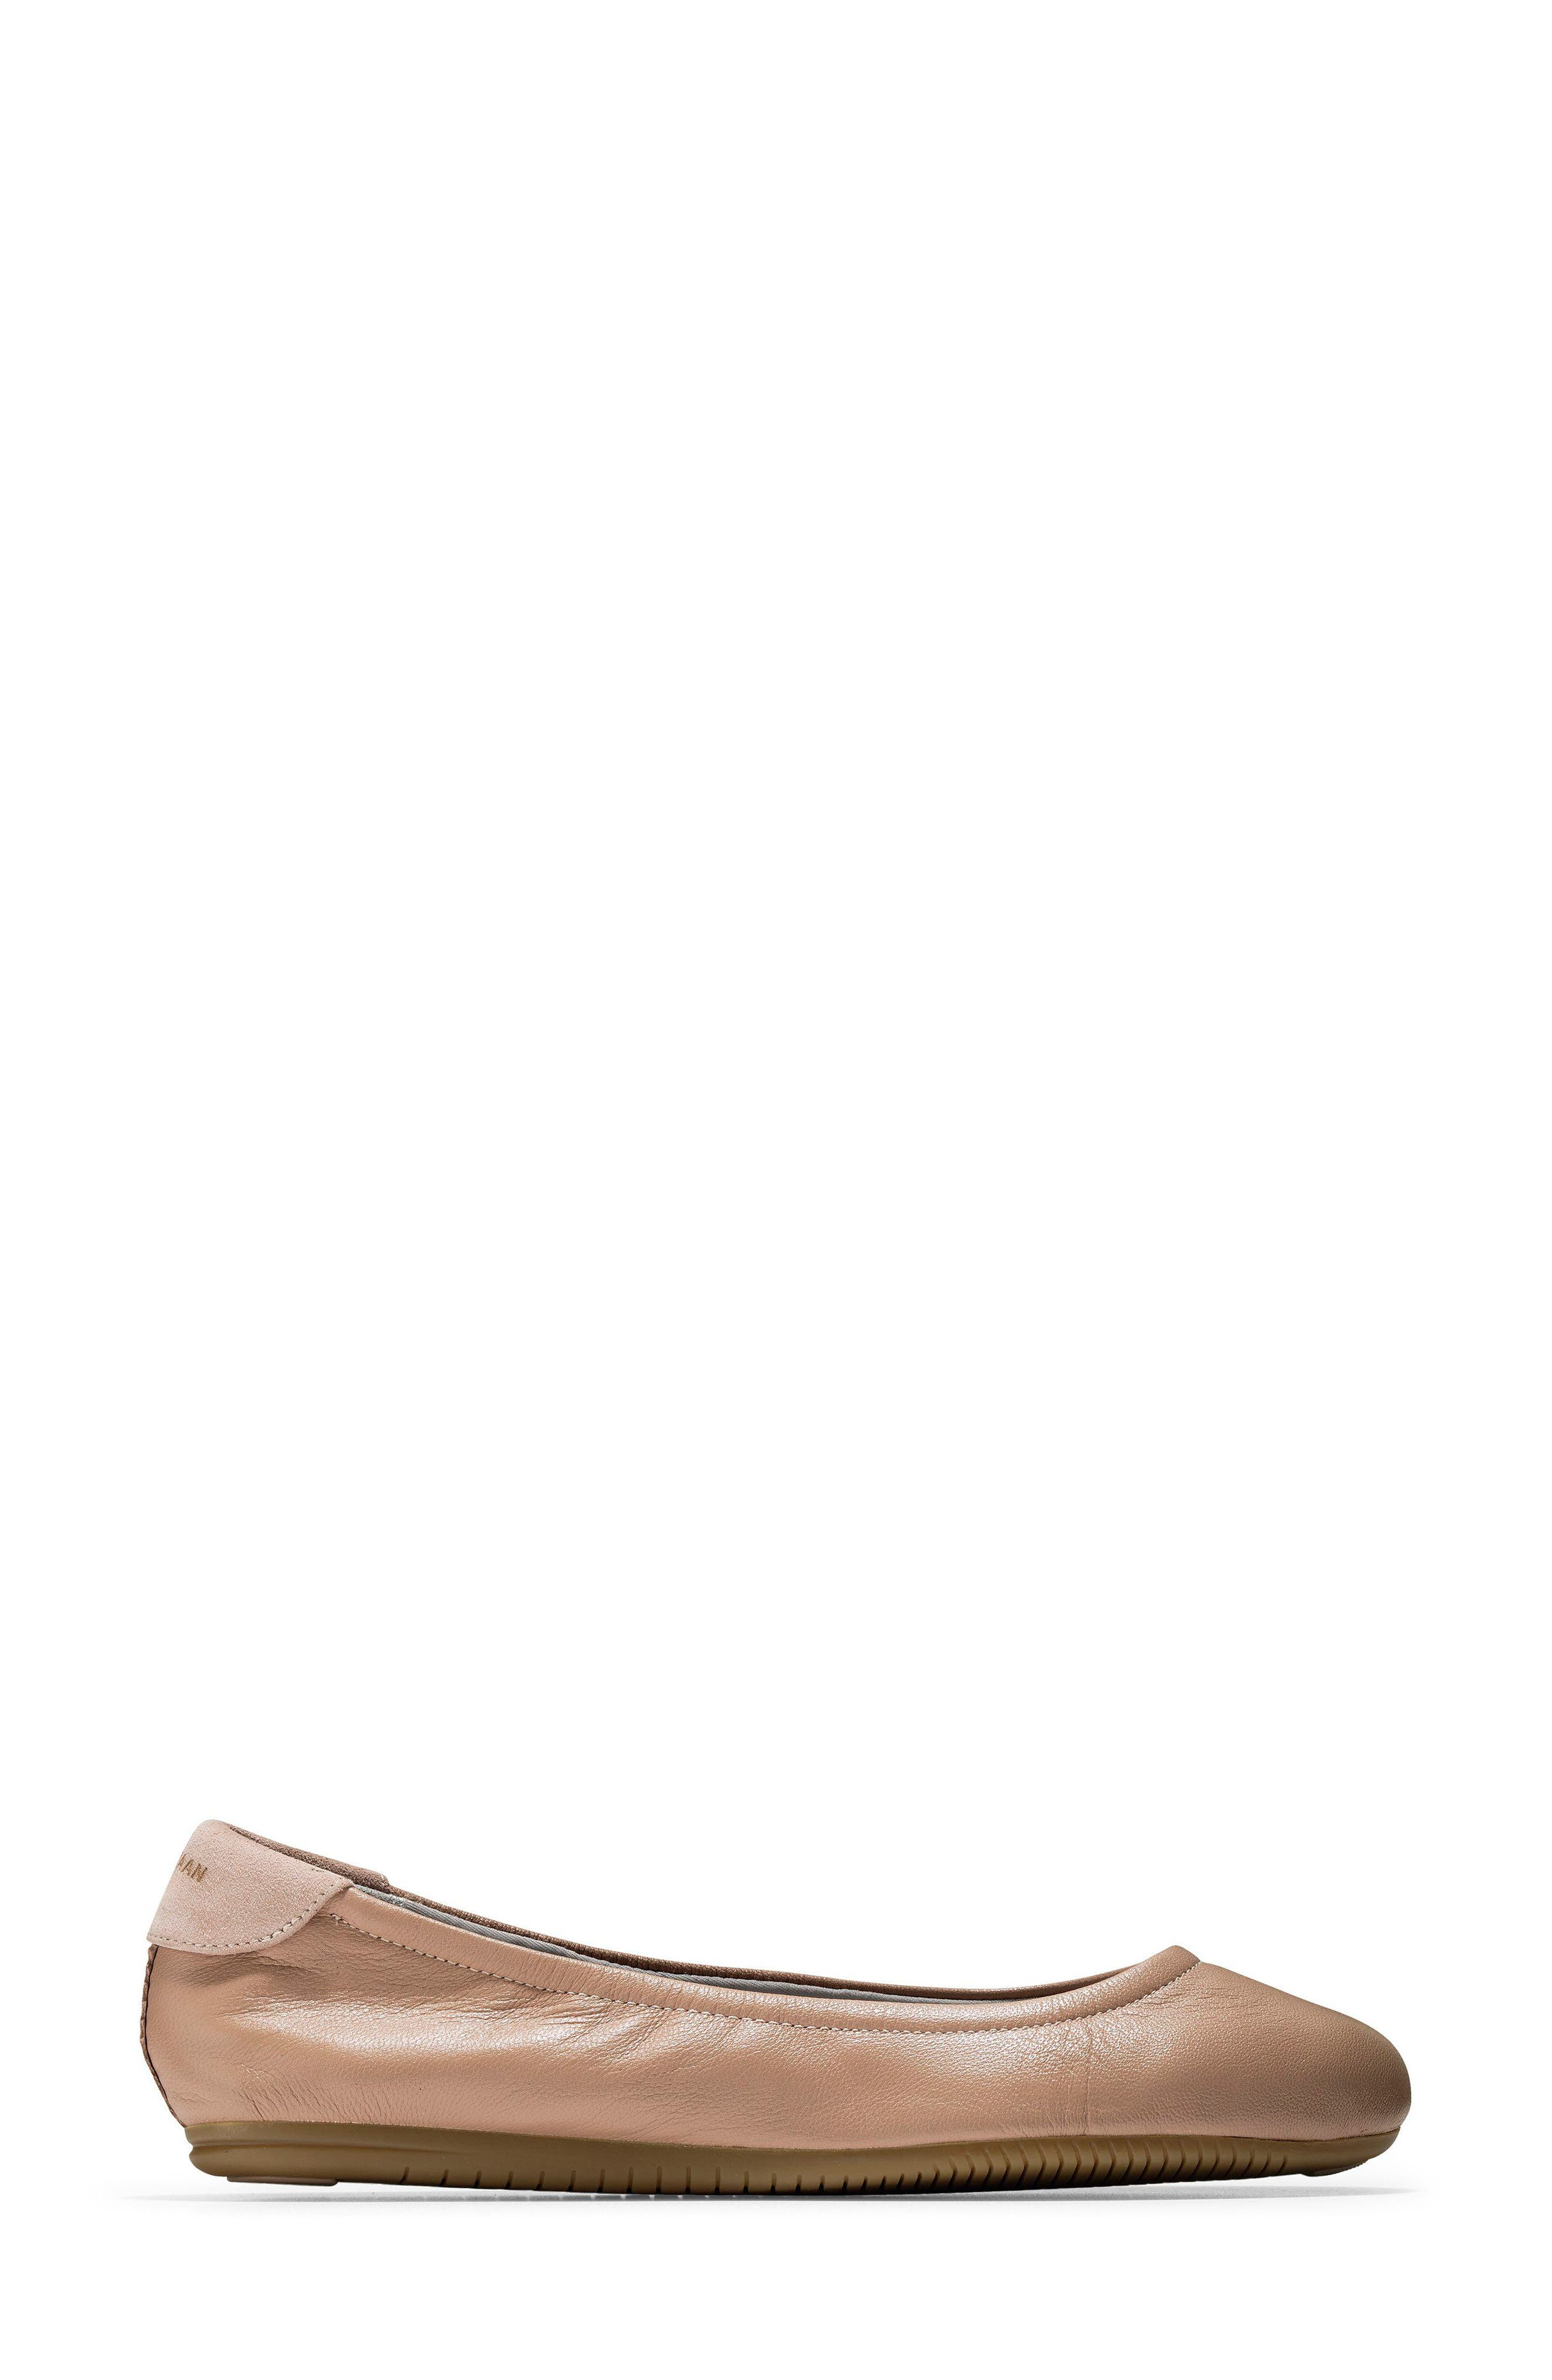 Studiogrand Ballet Flat,                             Alternate thumbnail 3, color,                             Maple Sugar Leather